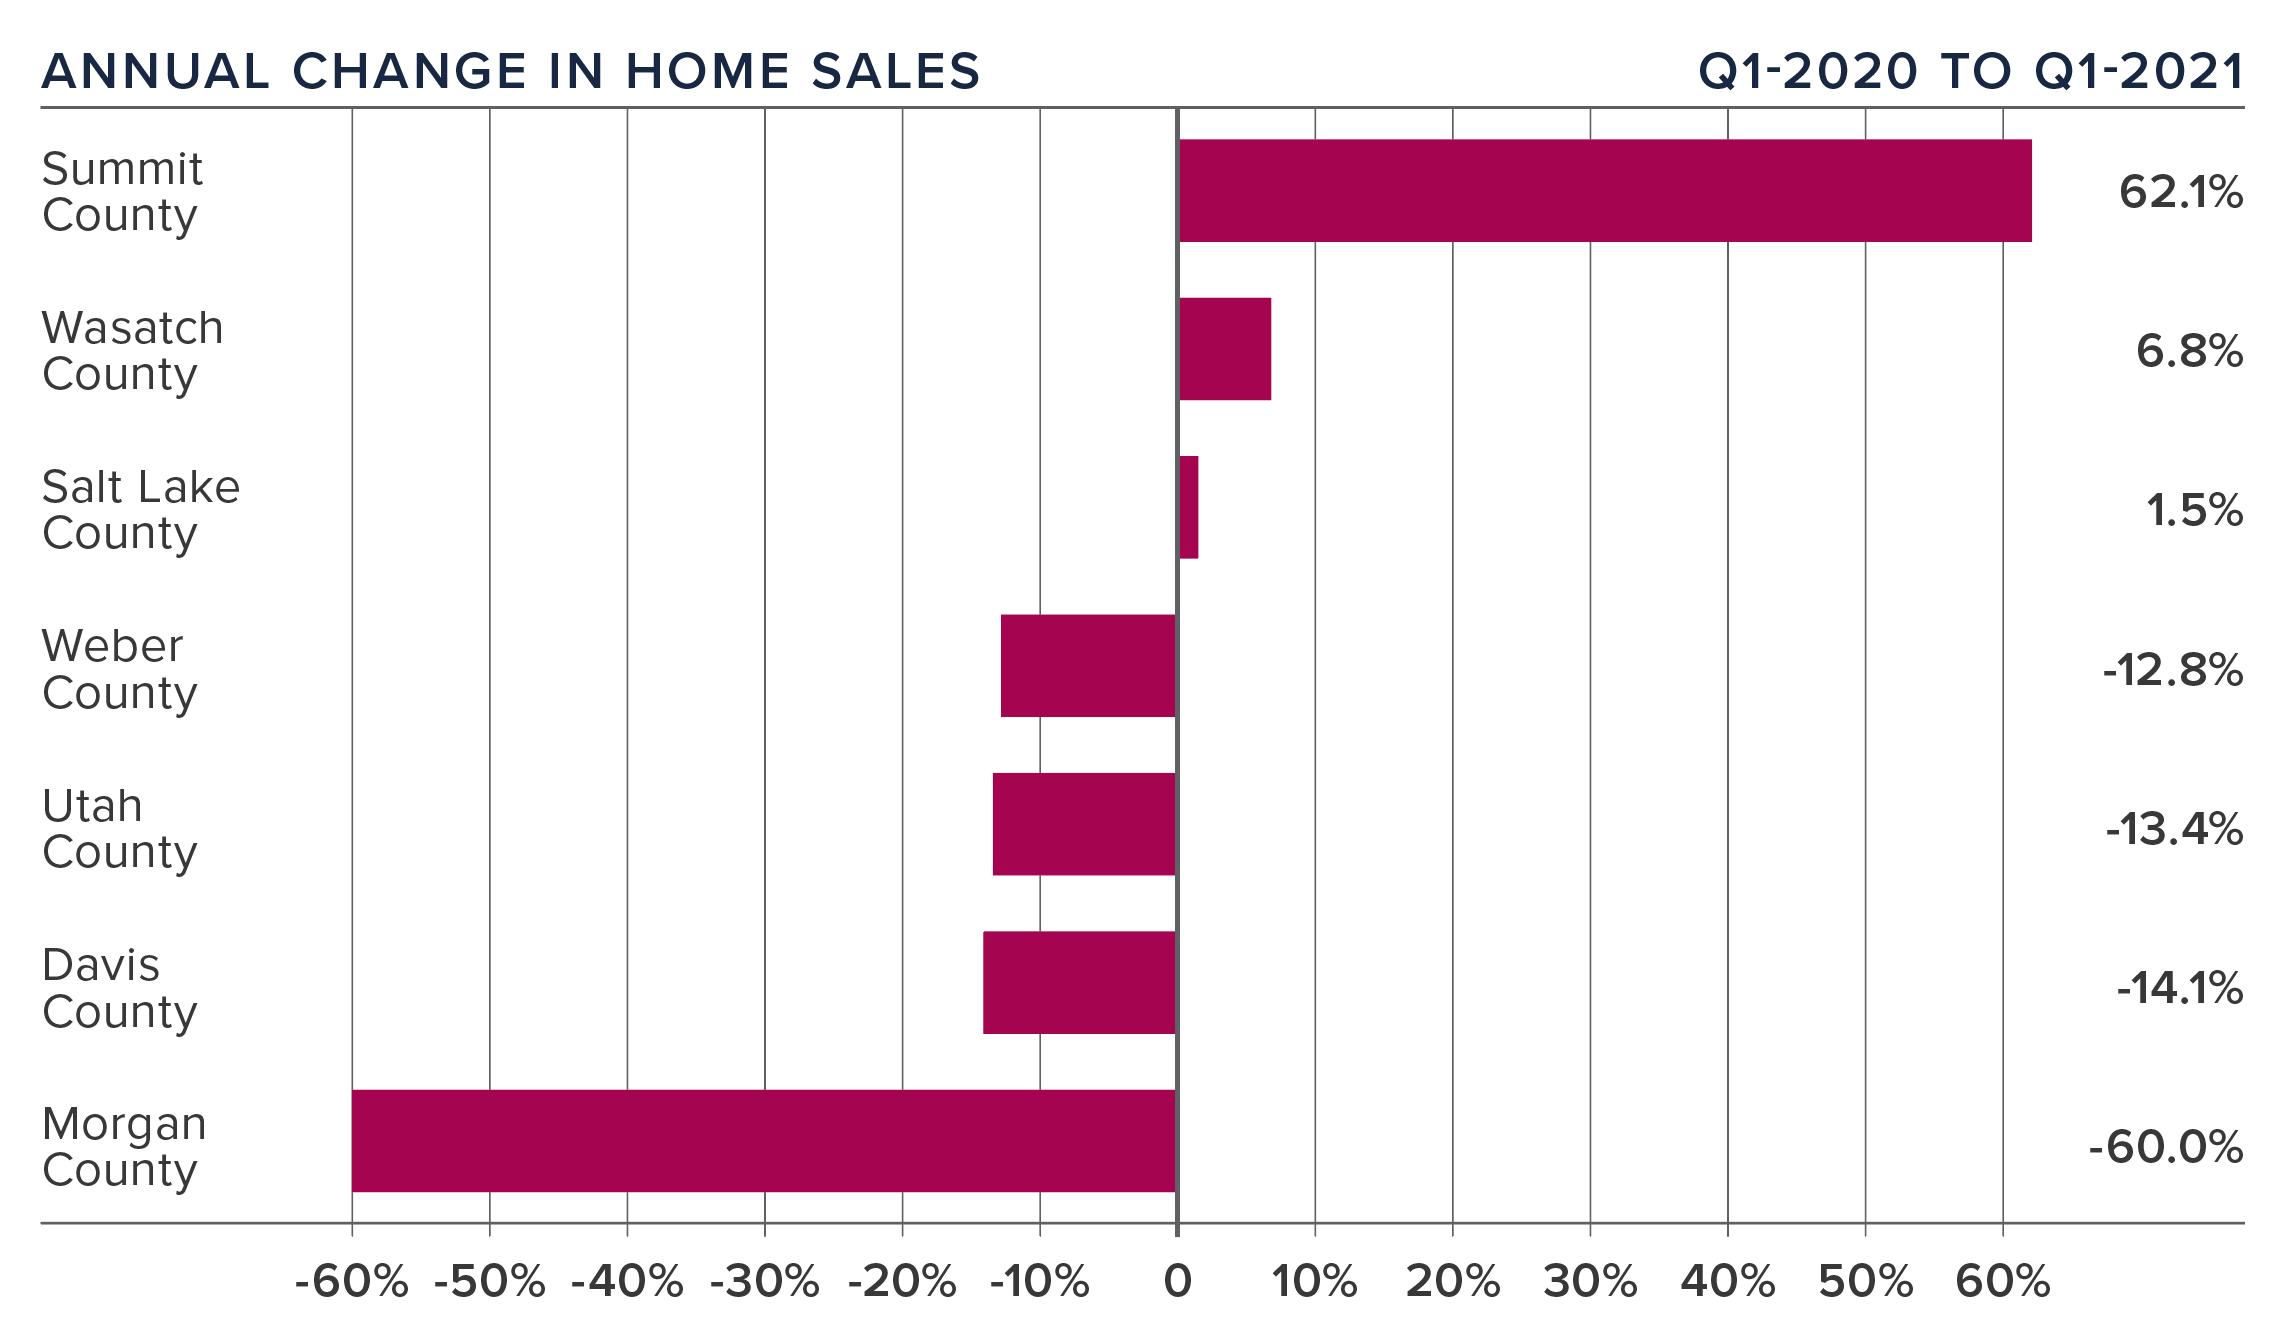 Annual-Change-Home-Sales-Windermere-Utah-Gardner-Report-Q1-2021